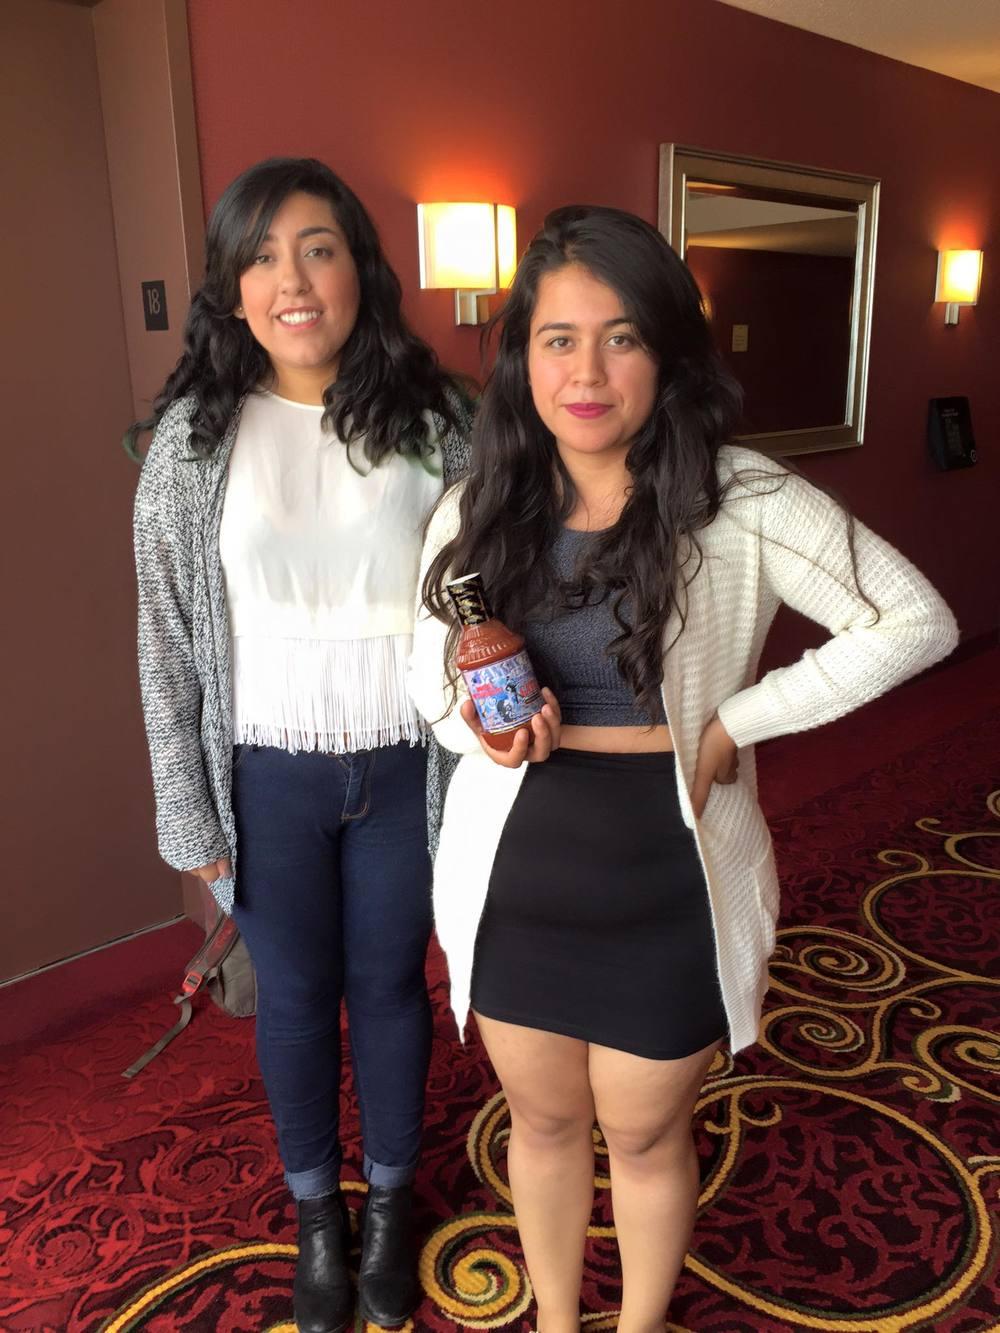 CSUF seniors Berenice Delgado and Gabriela Gonzalez are competing in the National Debate Tournament April 1-6 in New York.